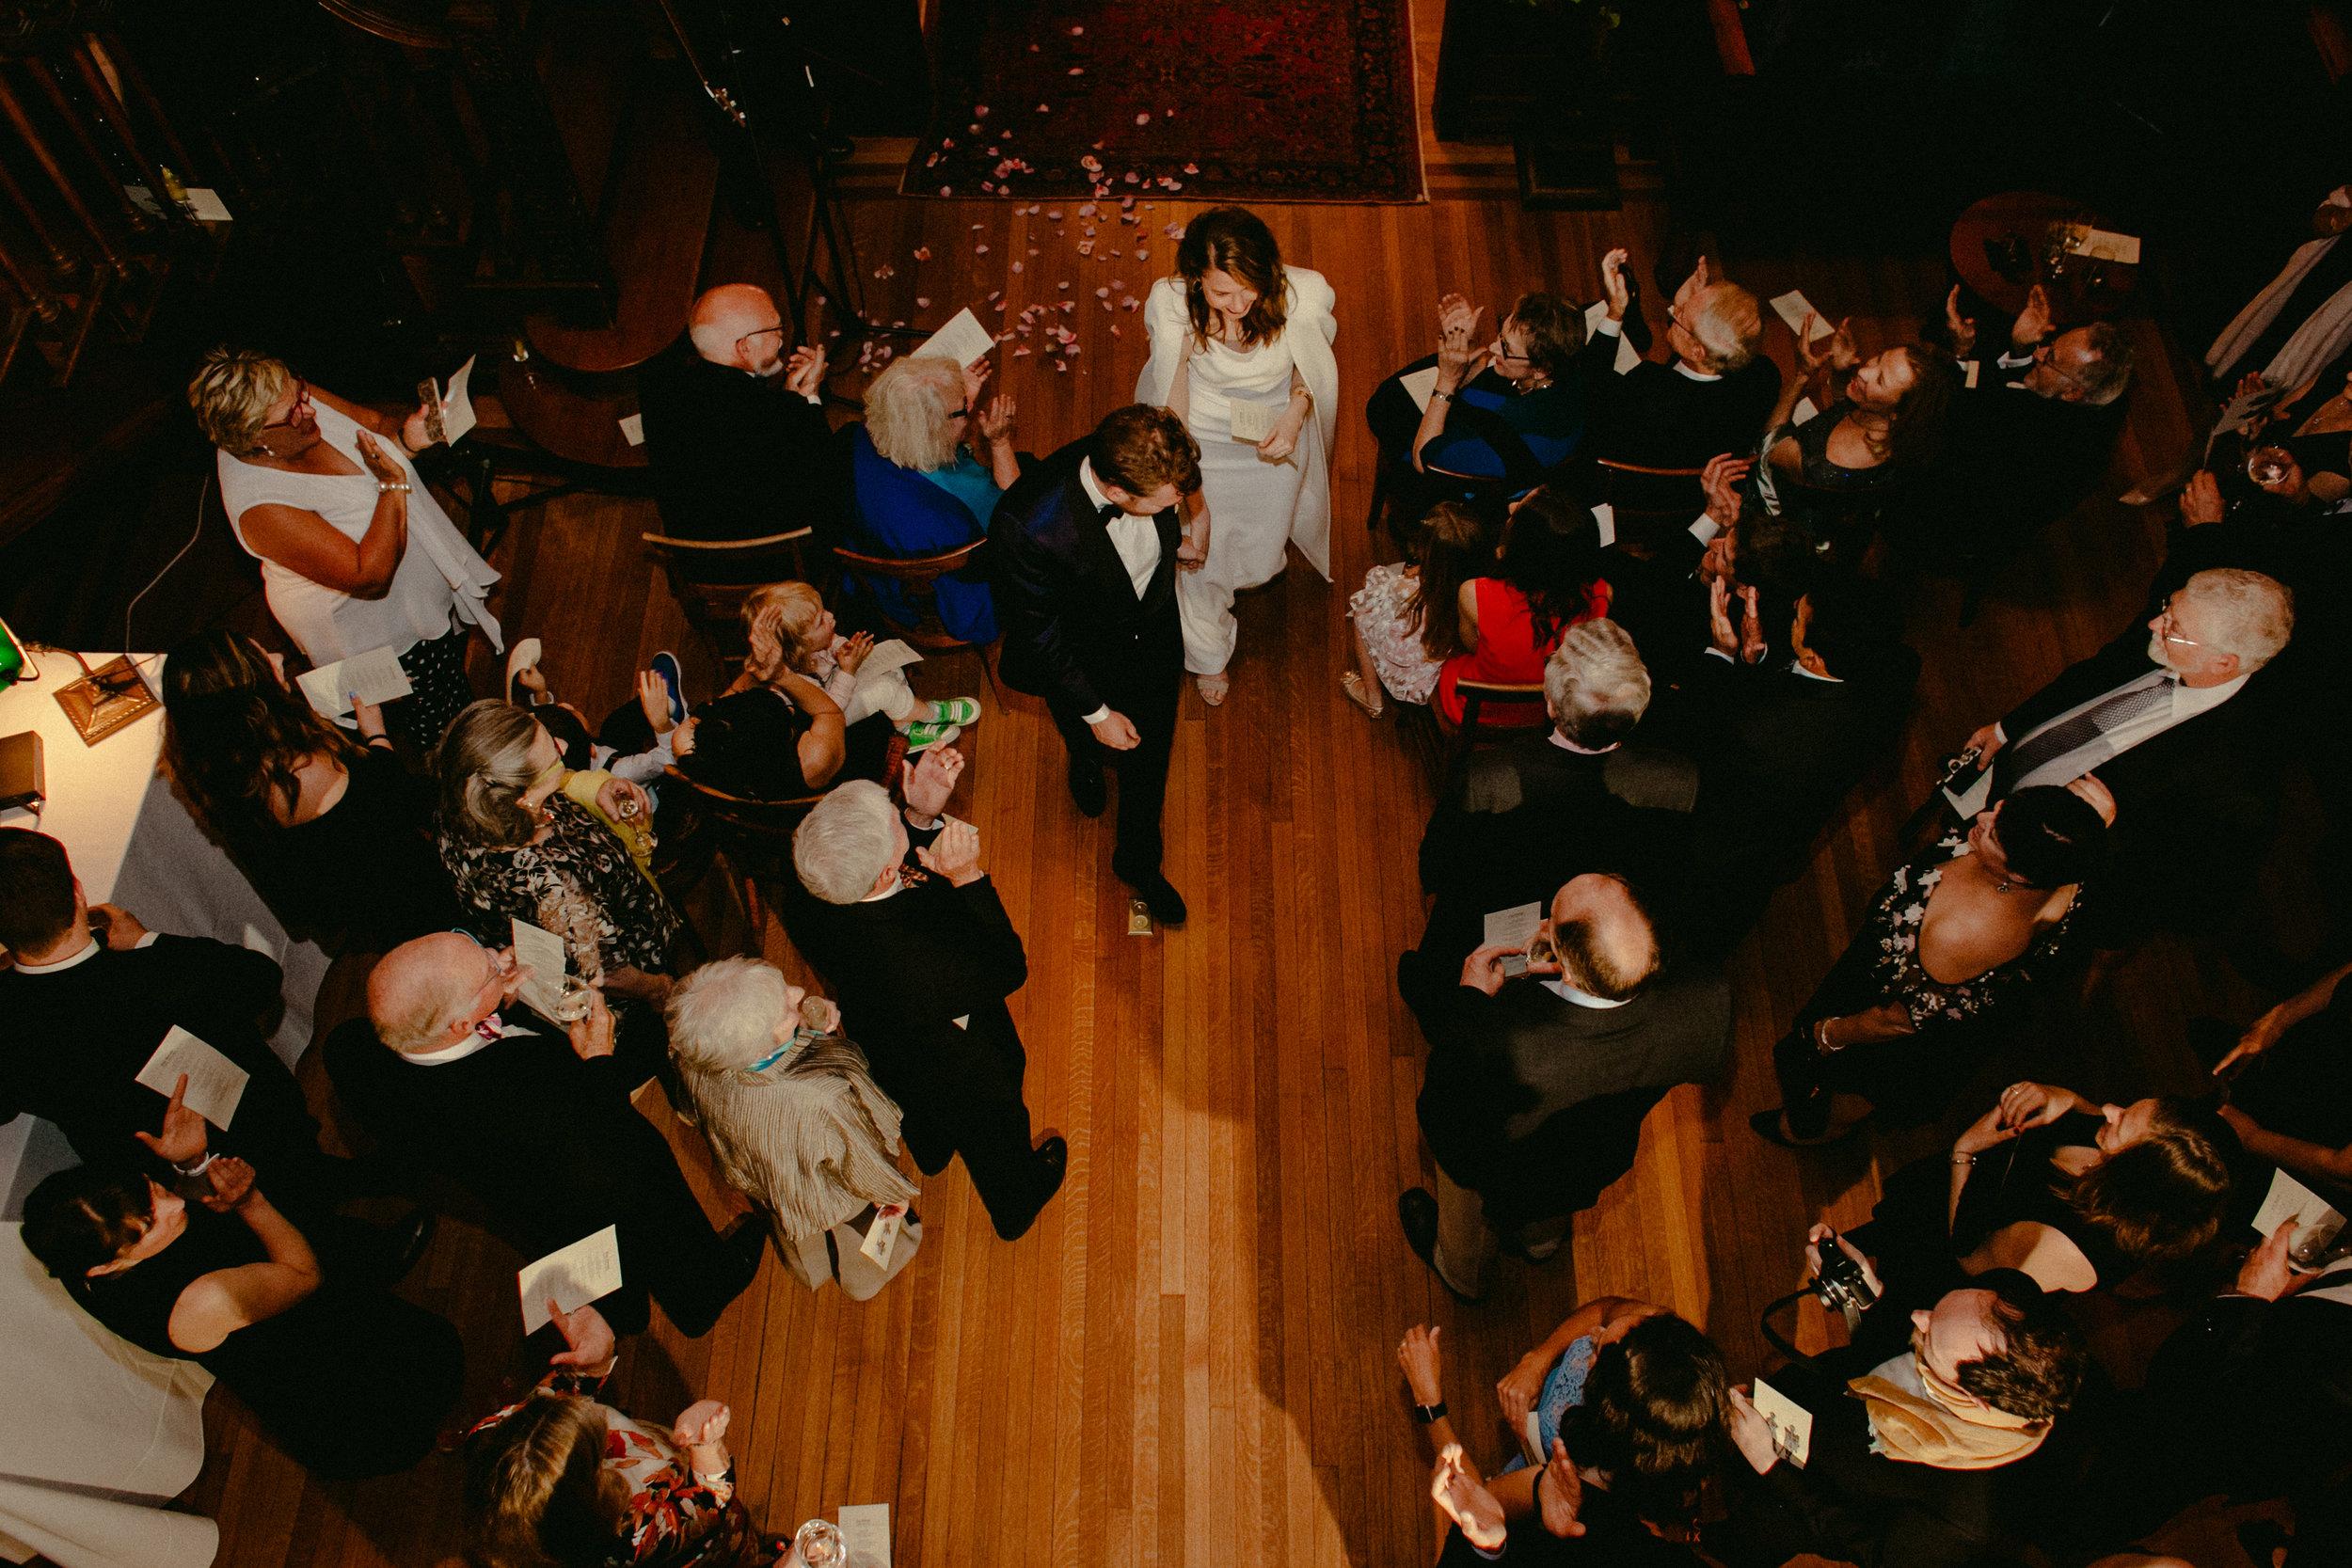 Tiger_House_The_Inn_at_Hudson-Wedding_Chellise_Michael_Photography-260.jpg